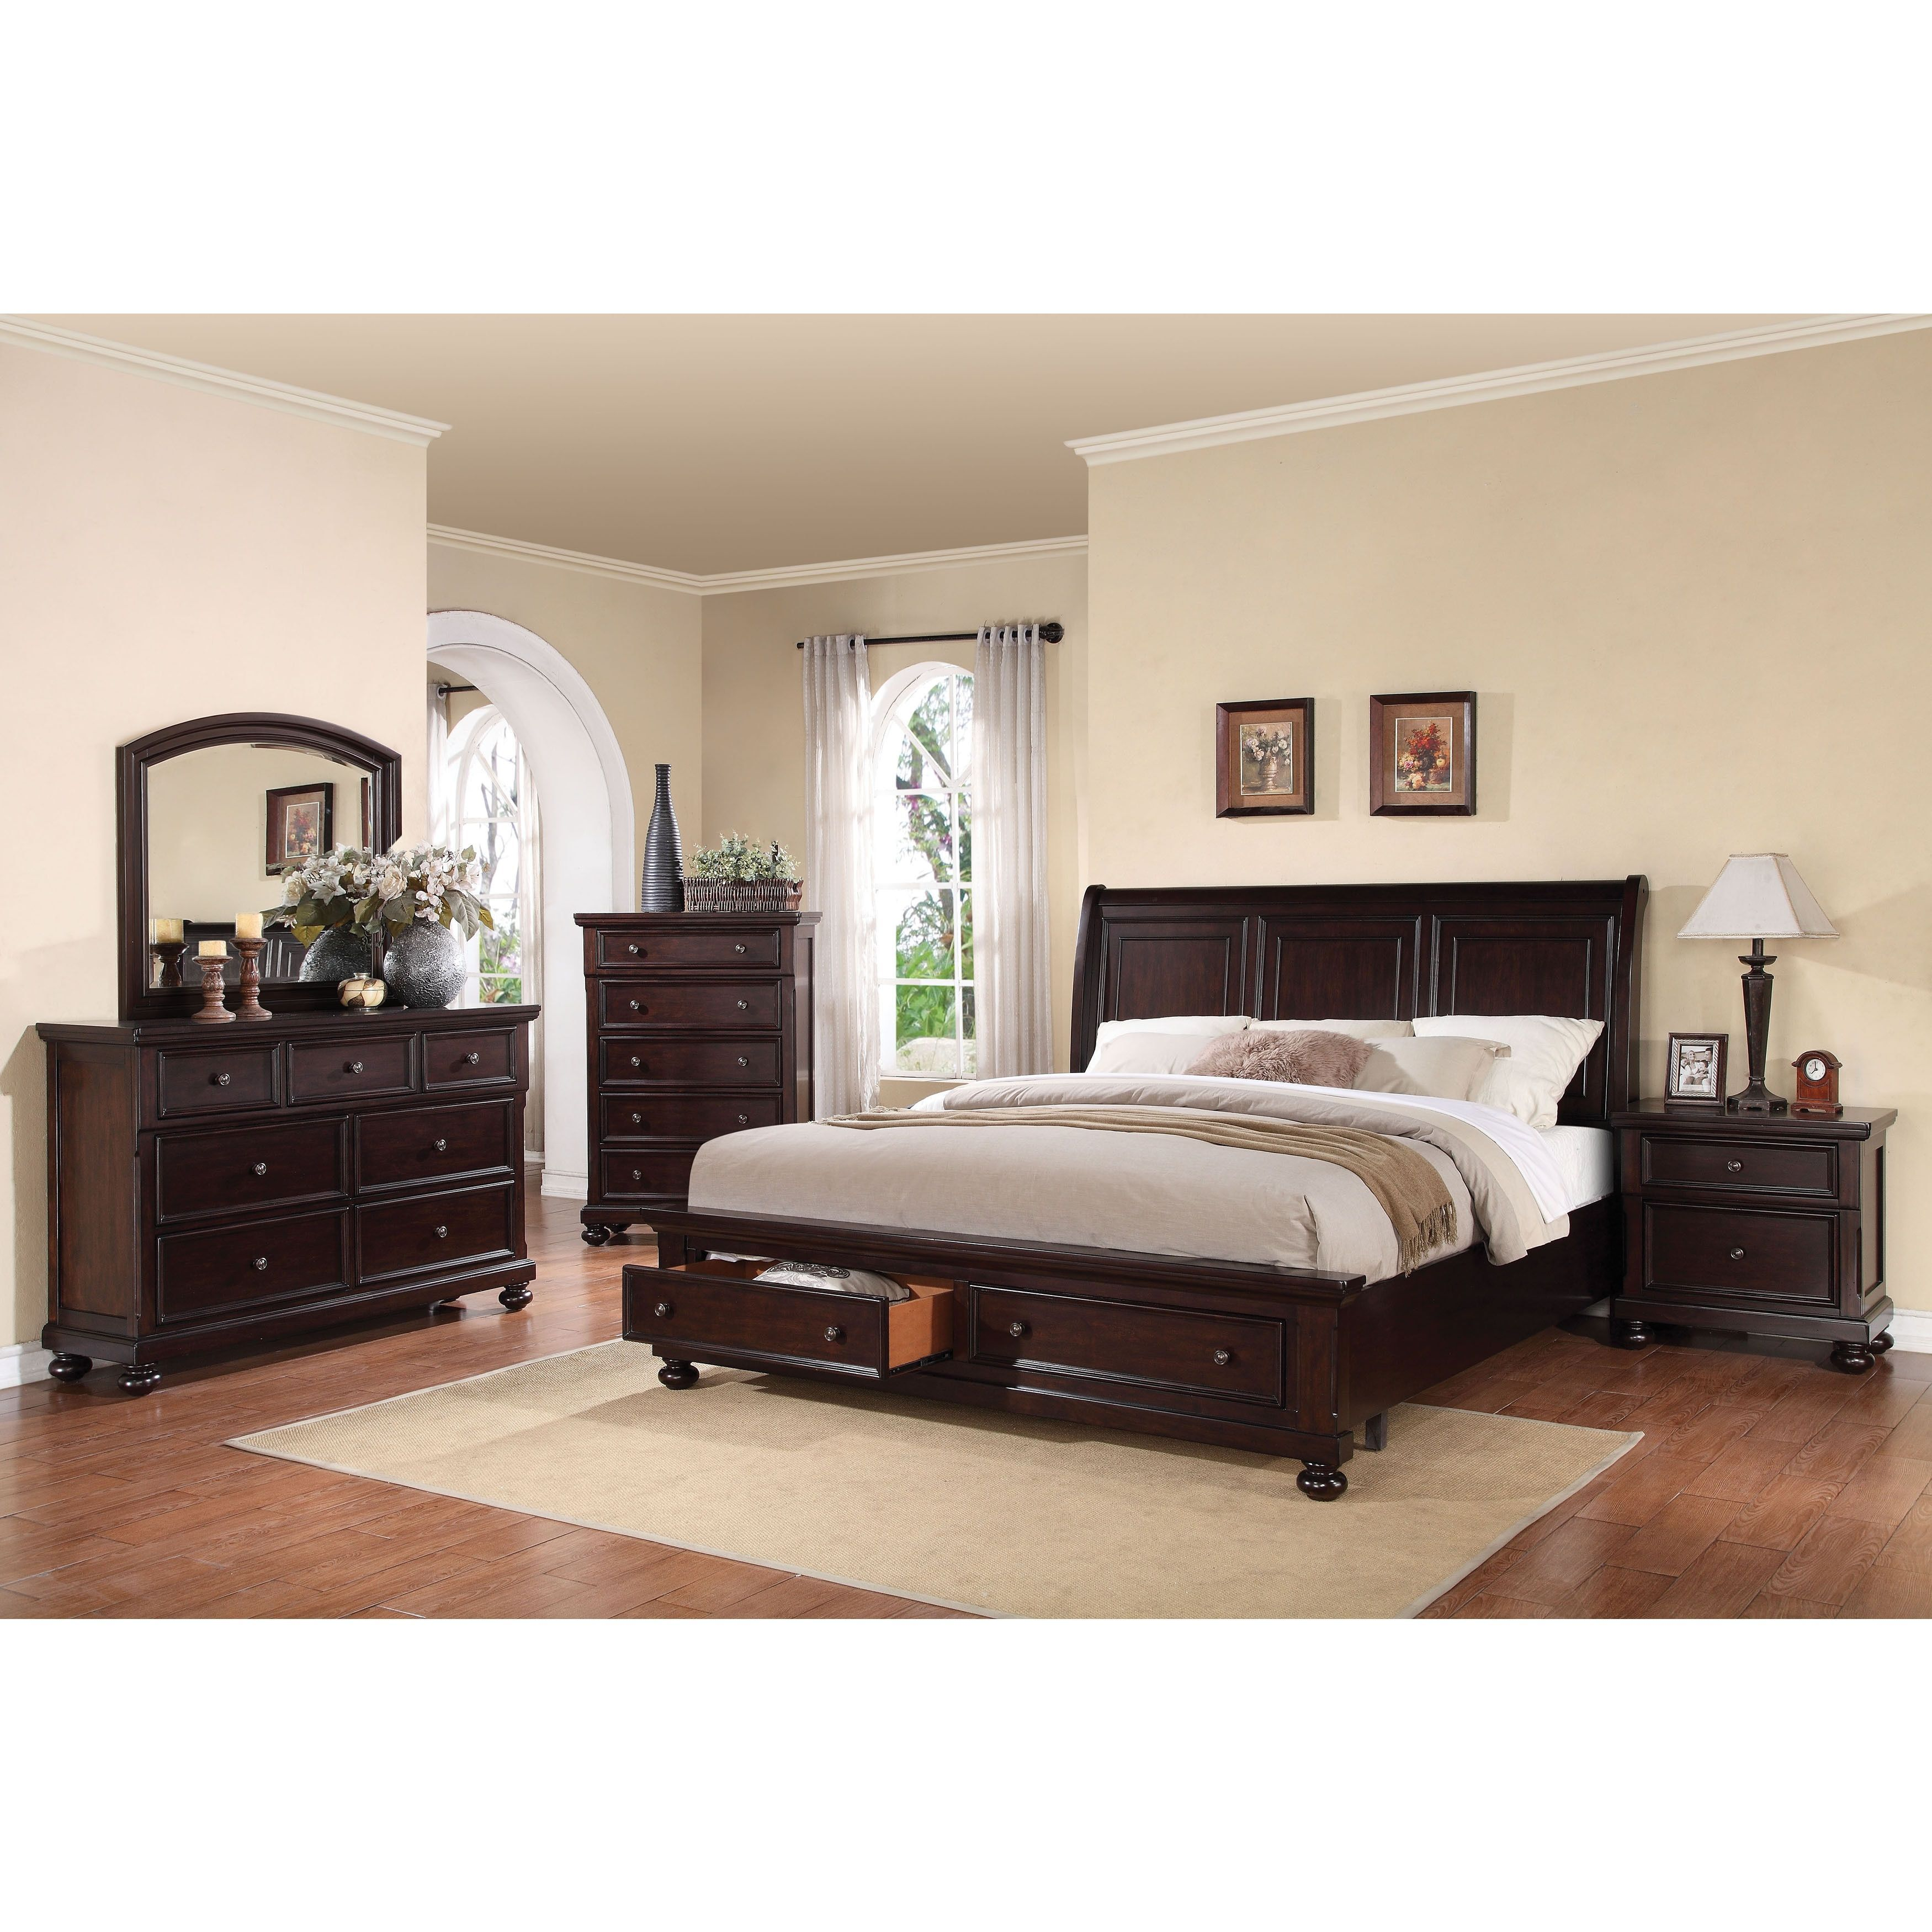 Acme Furniture Grayson 4-piece Storage Sleigh Bedroom Set ...